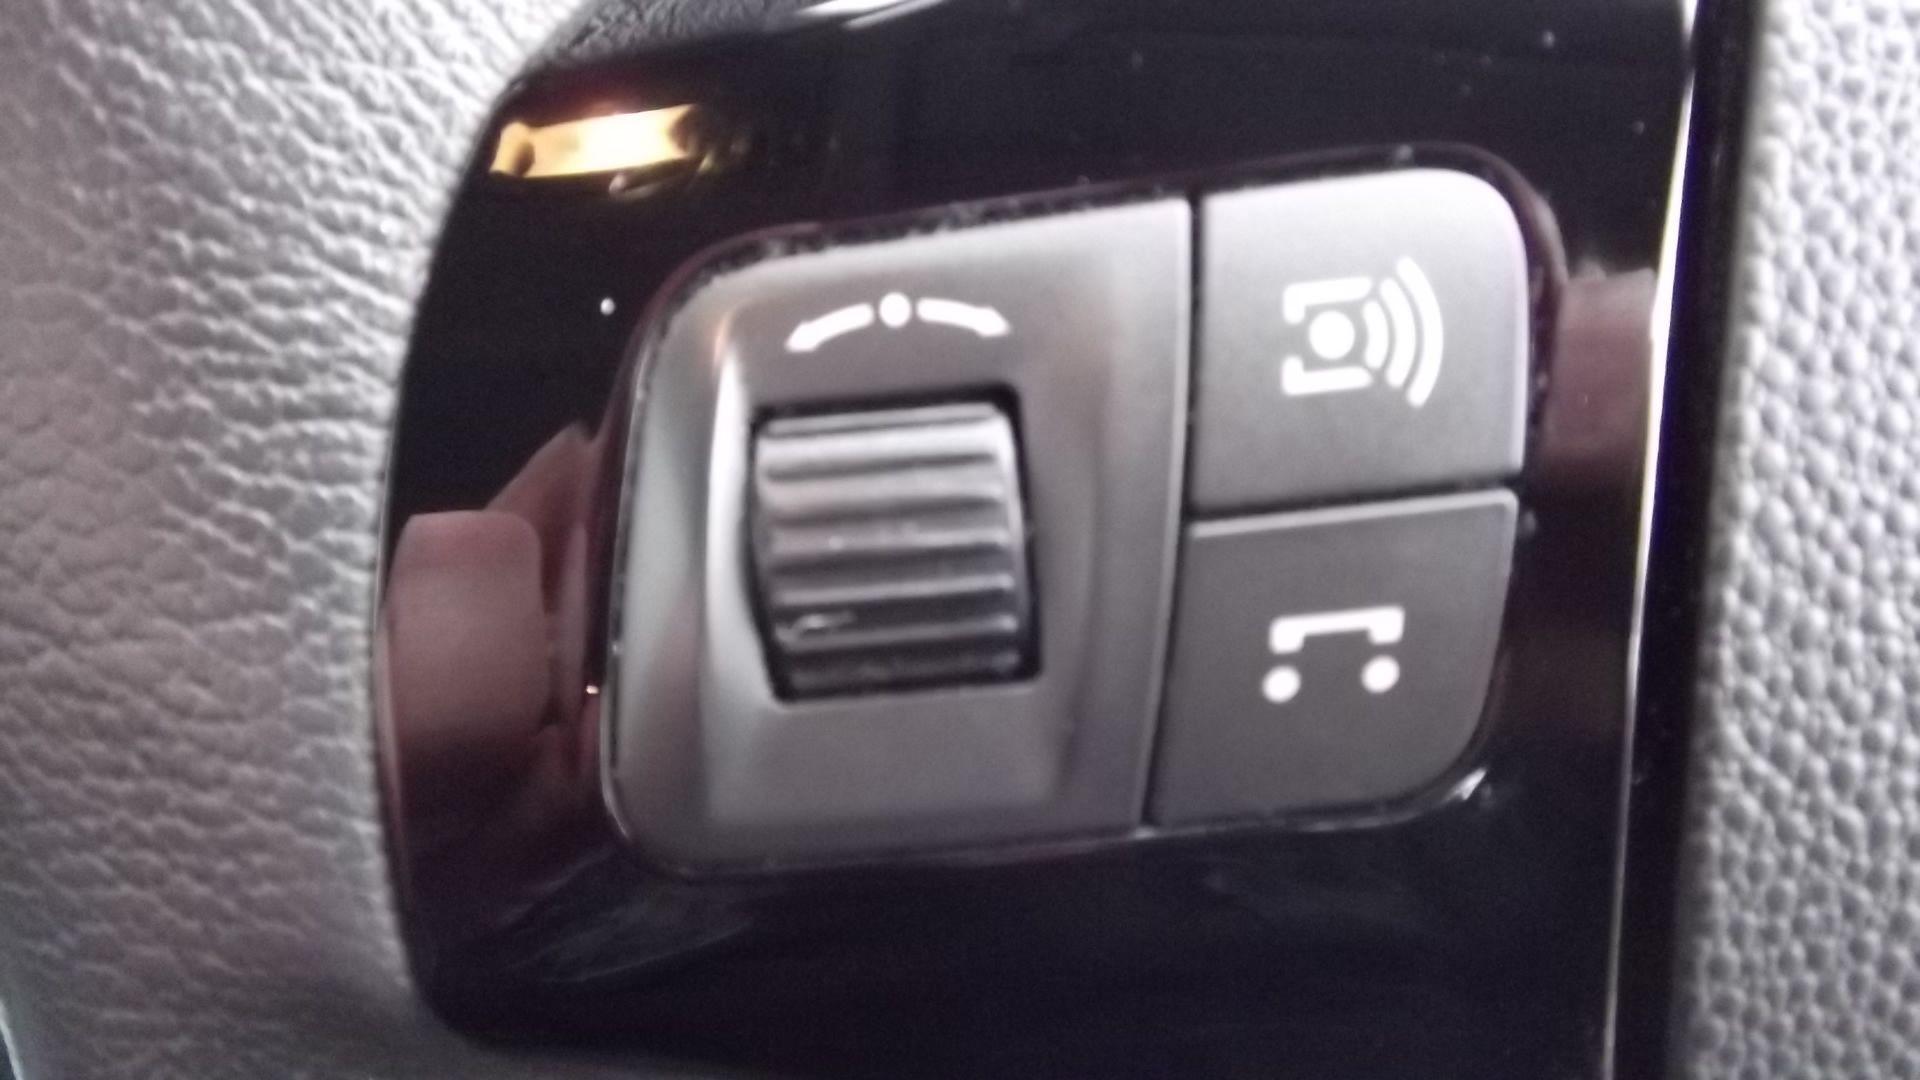 2014 Vauxhall Corsa Se 5Dr Hatchback - Full Service History - CL505 - NO VAT ON THE HAMMER - - Image 20 of 24